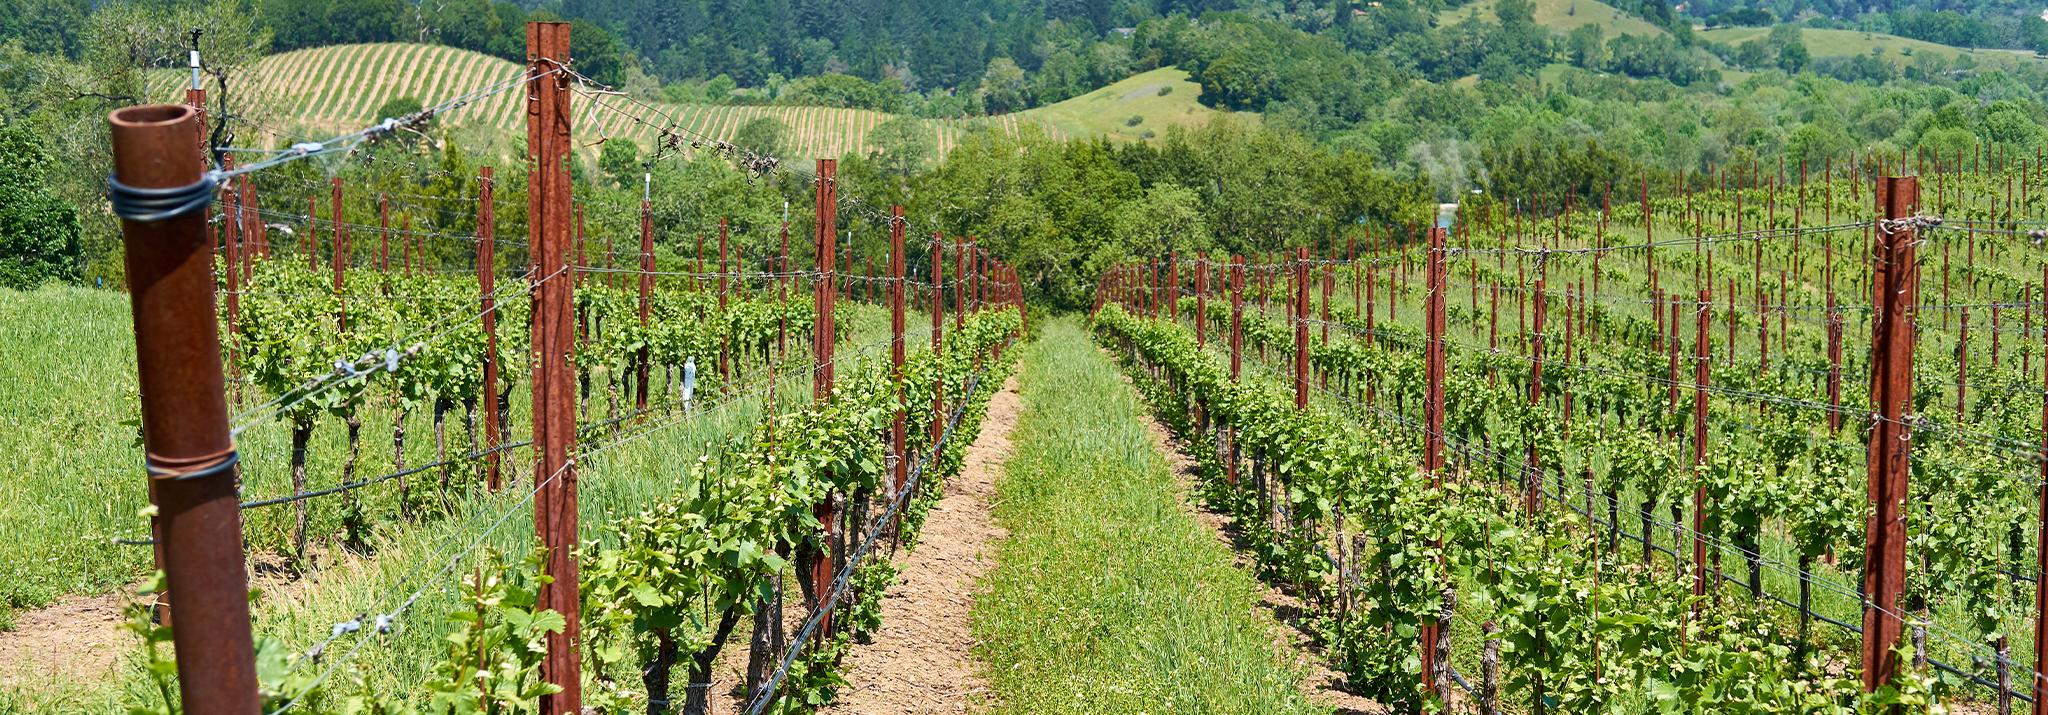 corison-vinyard-napa-valley-cabernet-sauvignon-wines-usa